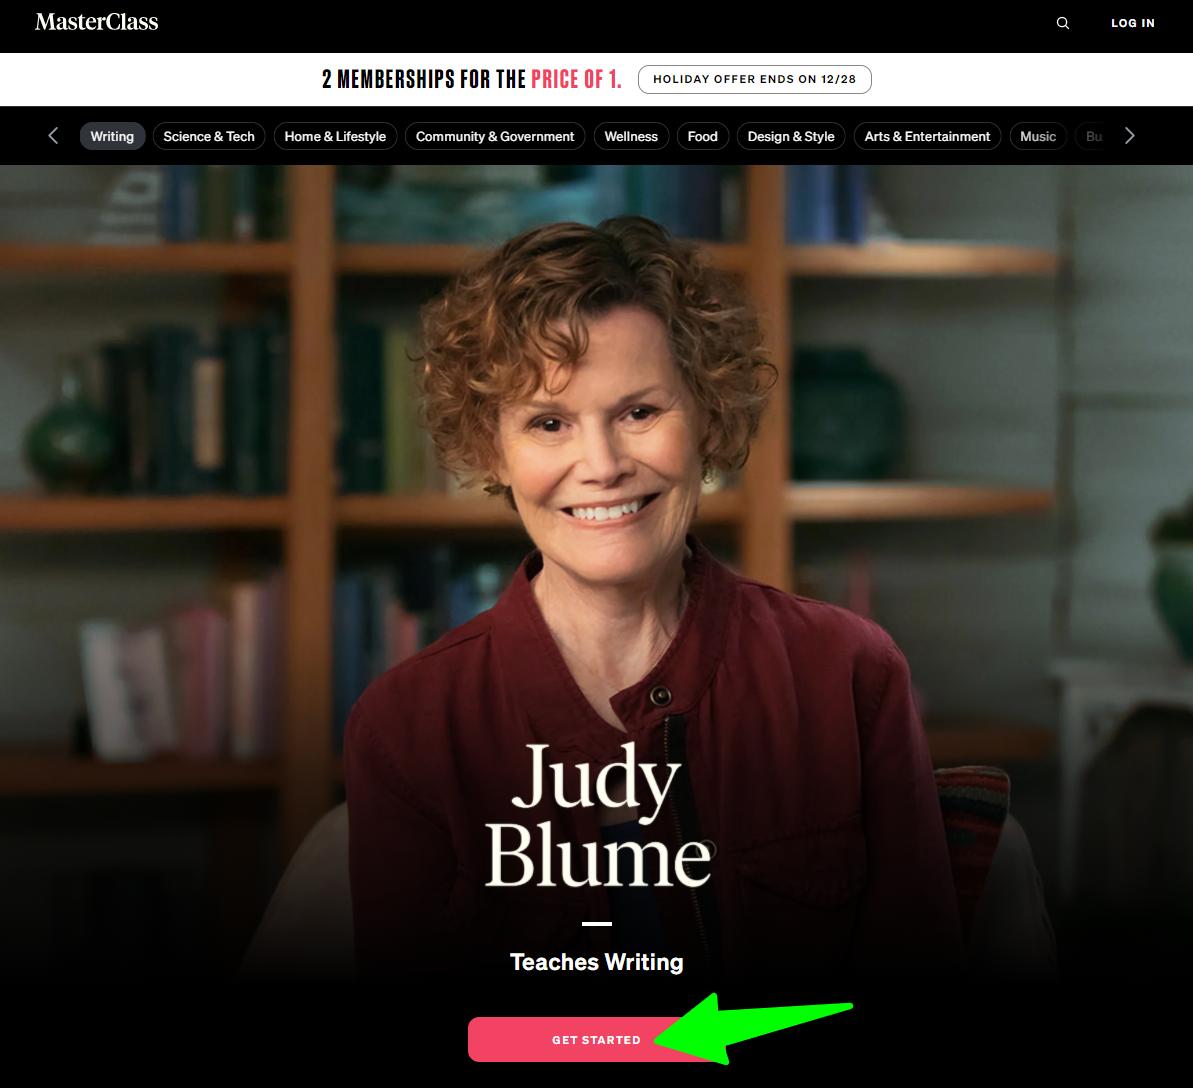 Judy-Blume-Teaches-Writing-MasterClass